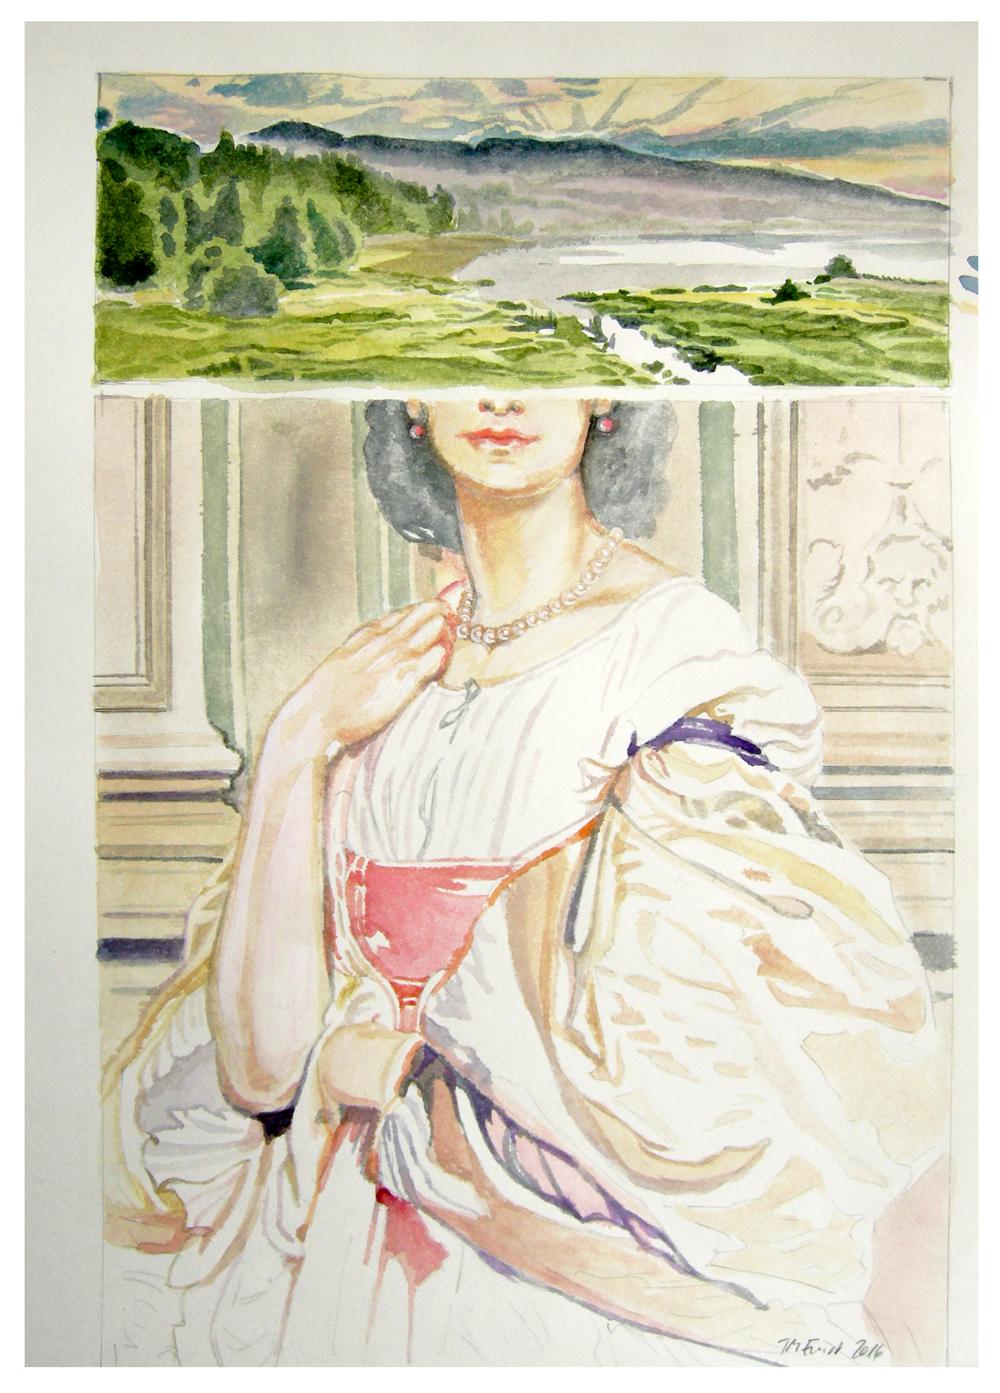 ideale landschaft 11 –römische dame – Aquarell auf Papier, 29,7 x 21 cm, 2016